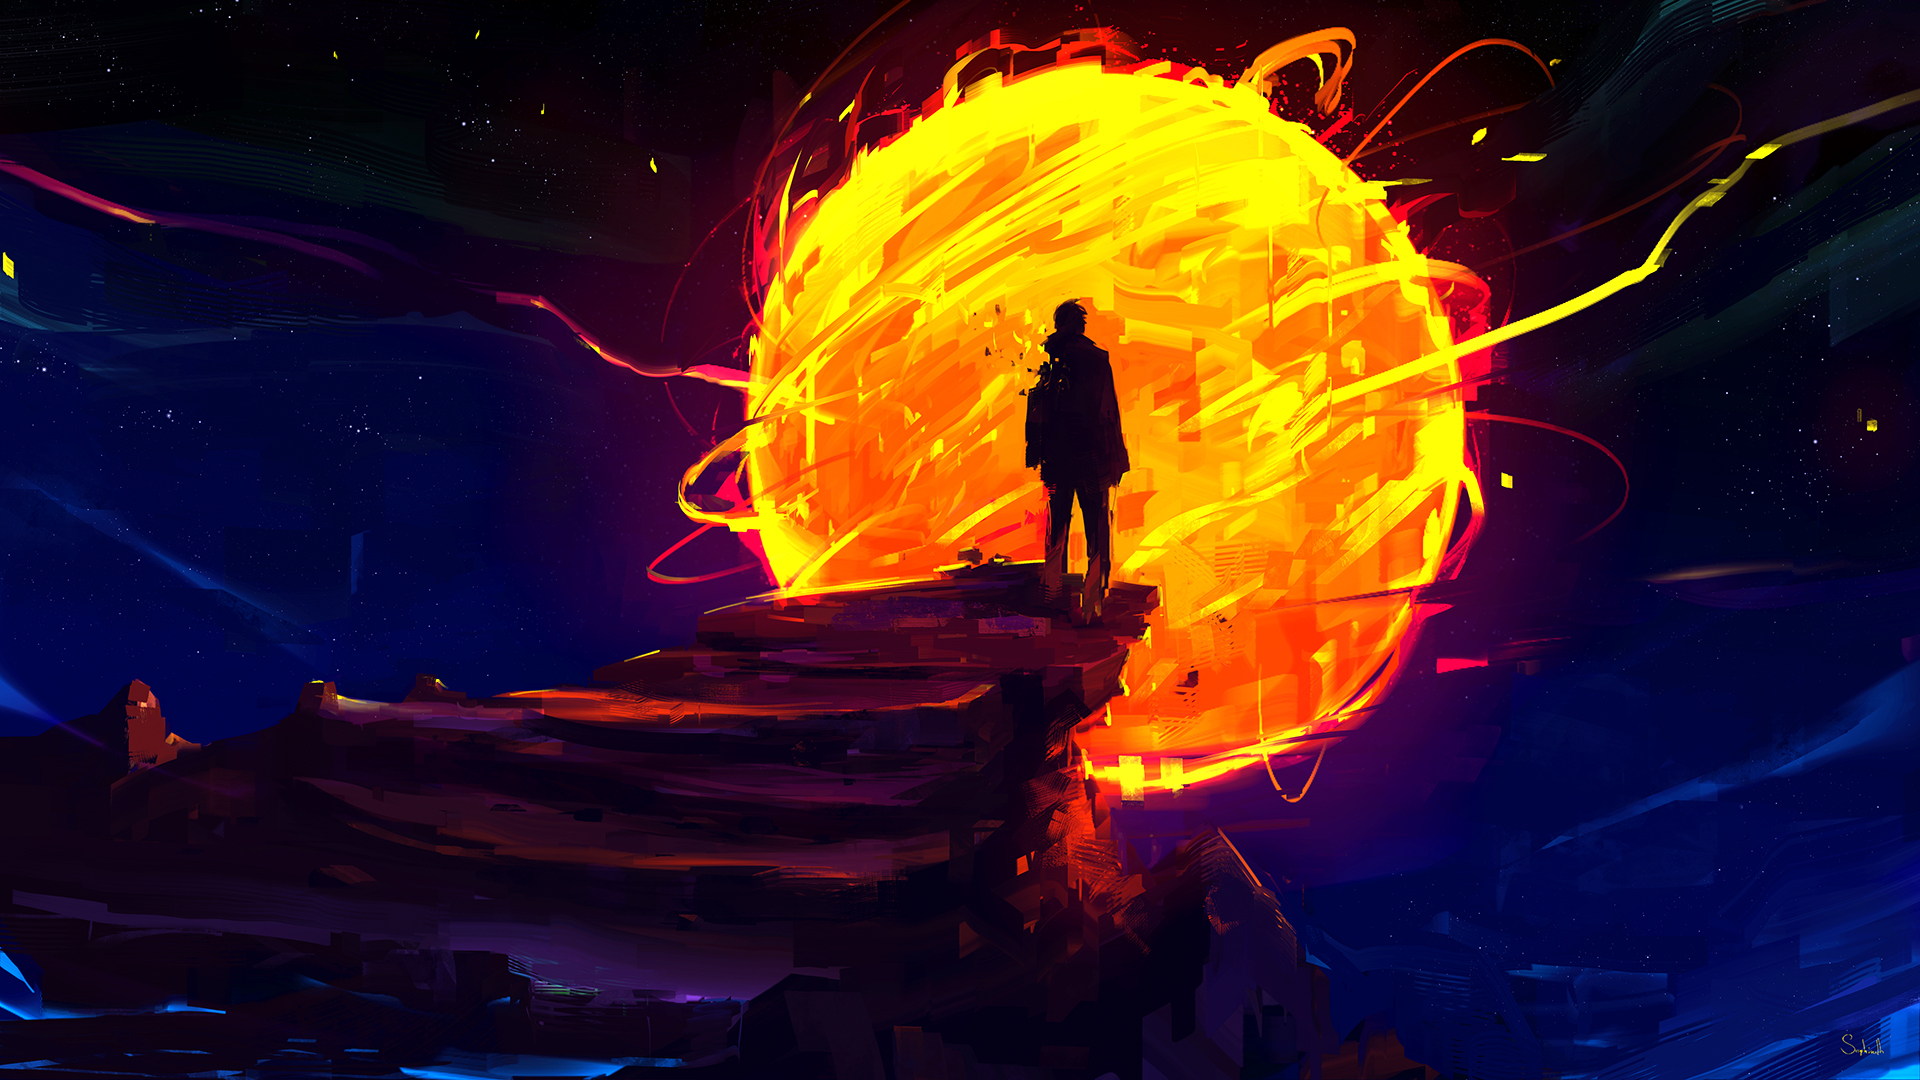 General 1920x1080 digital digital art artwork drawing painting digital painting fantasy art silhouette men Sun landscape burning sphere fire Sephiroth Art